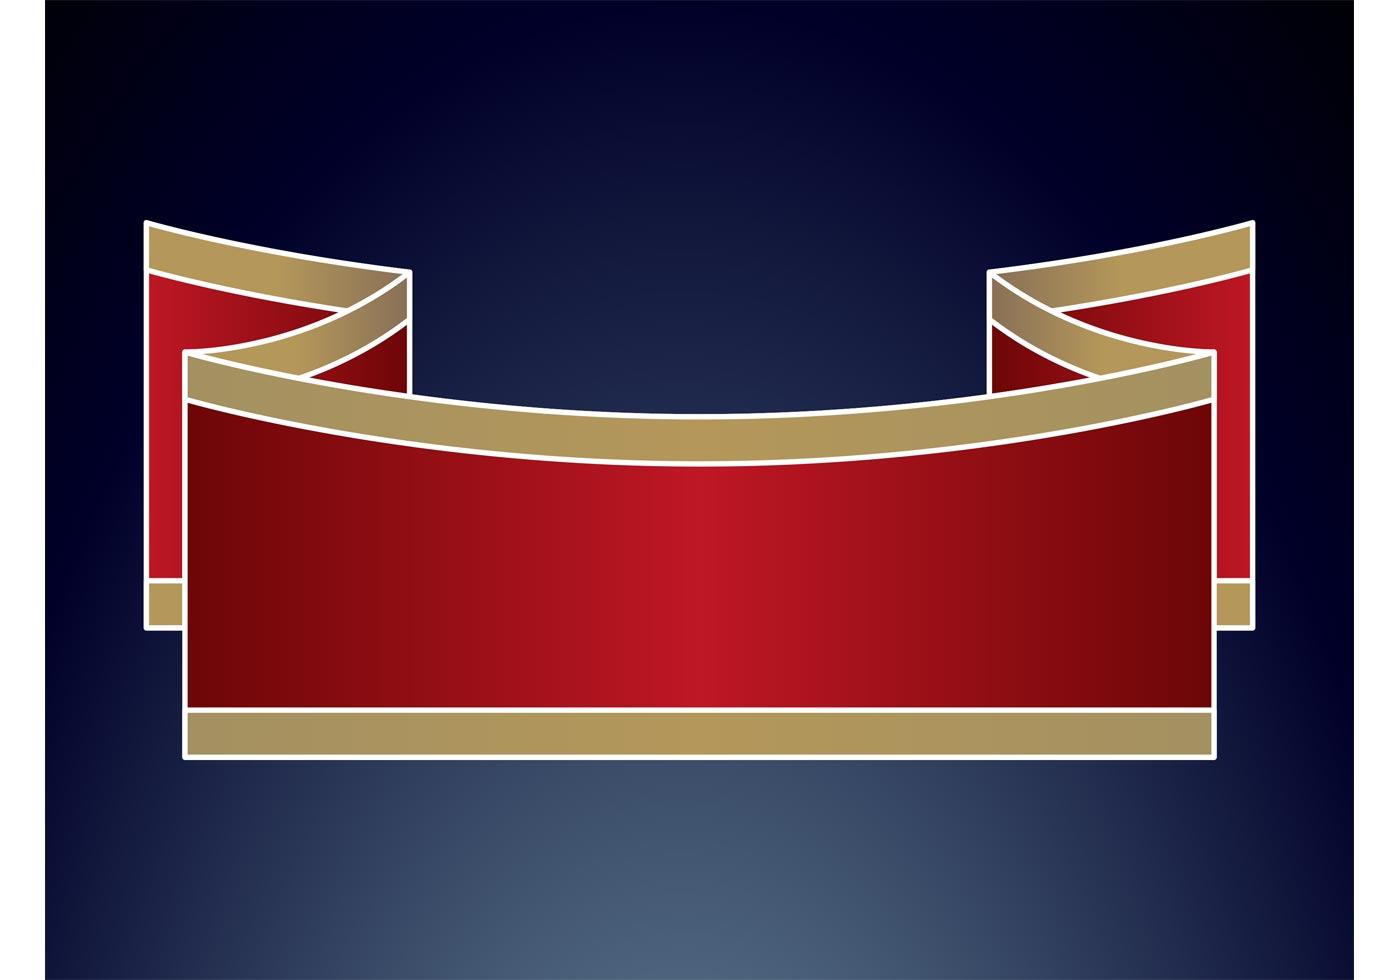 Minimal ribbon banner download free vector art stock for Minimal art vector